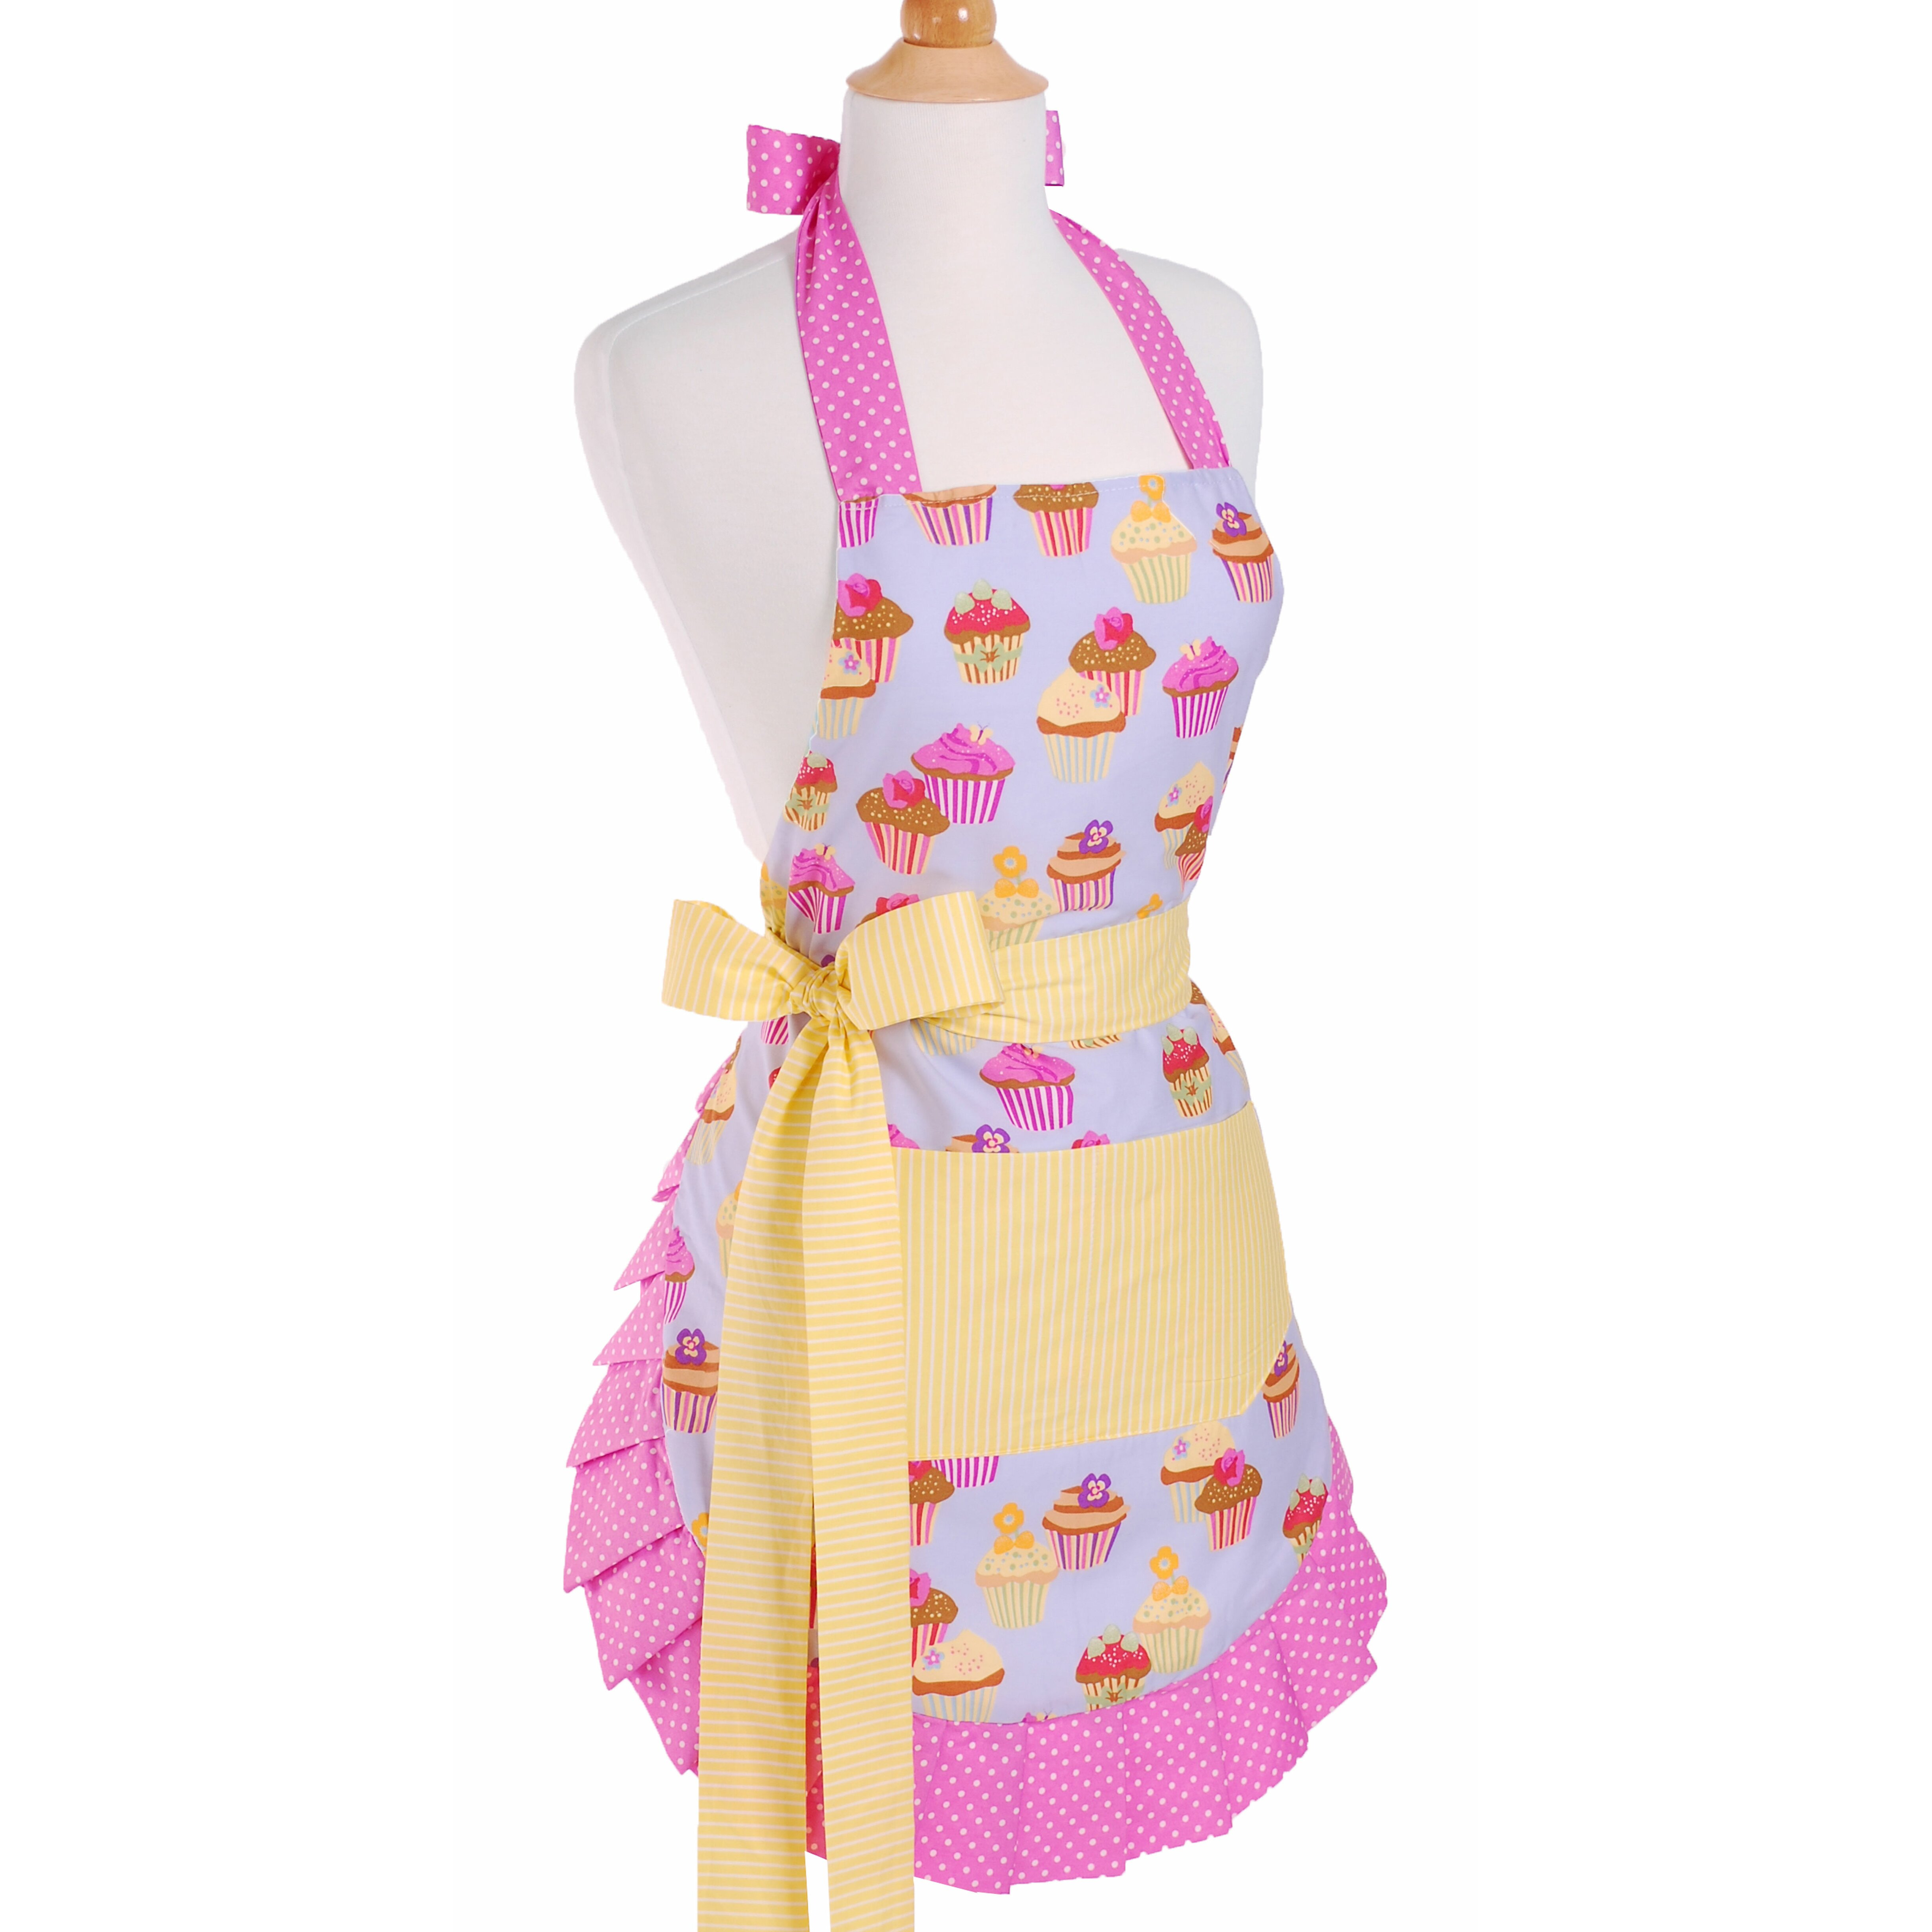 White apron chef fresno - Red Barrel Studio Reg Women S Apron In Frosted Cupcake